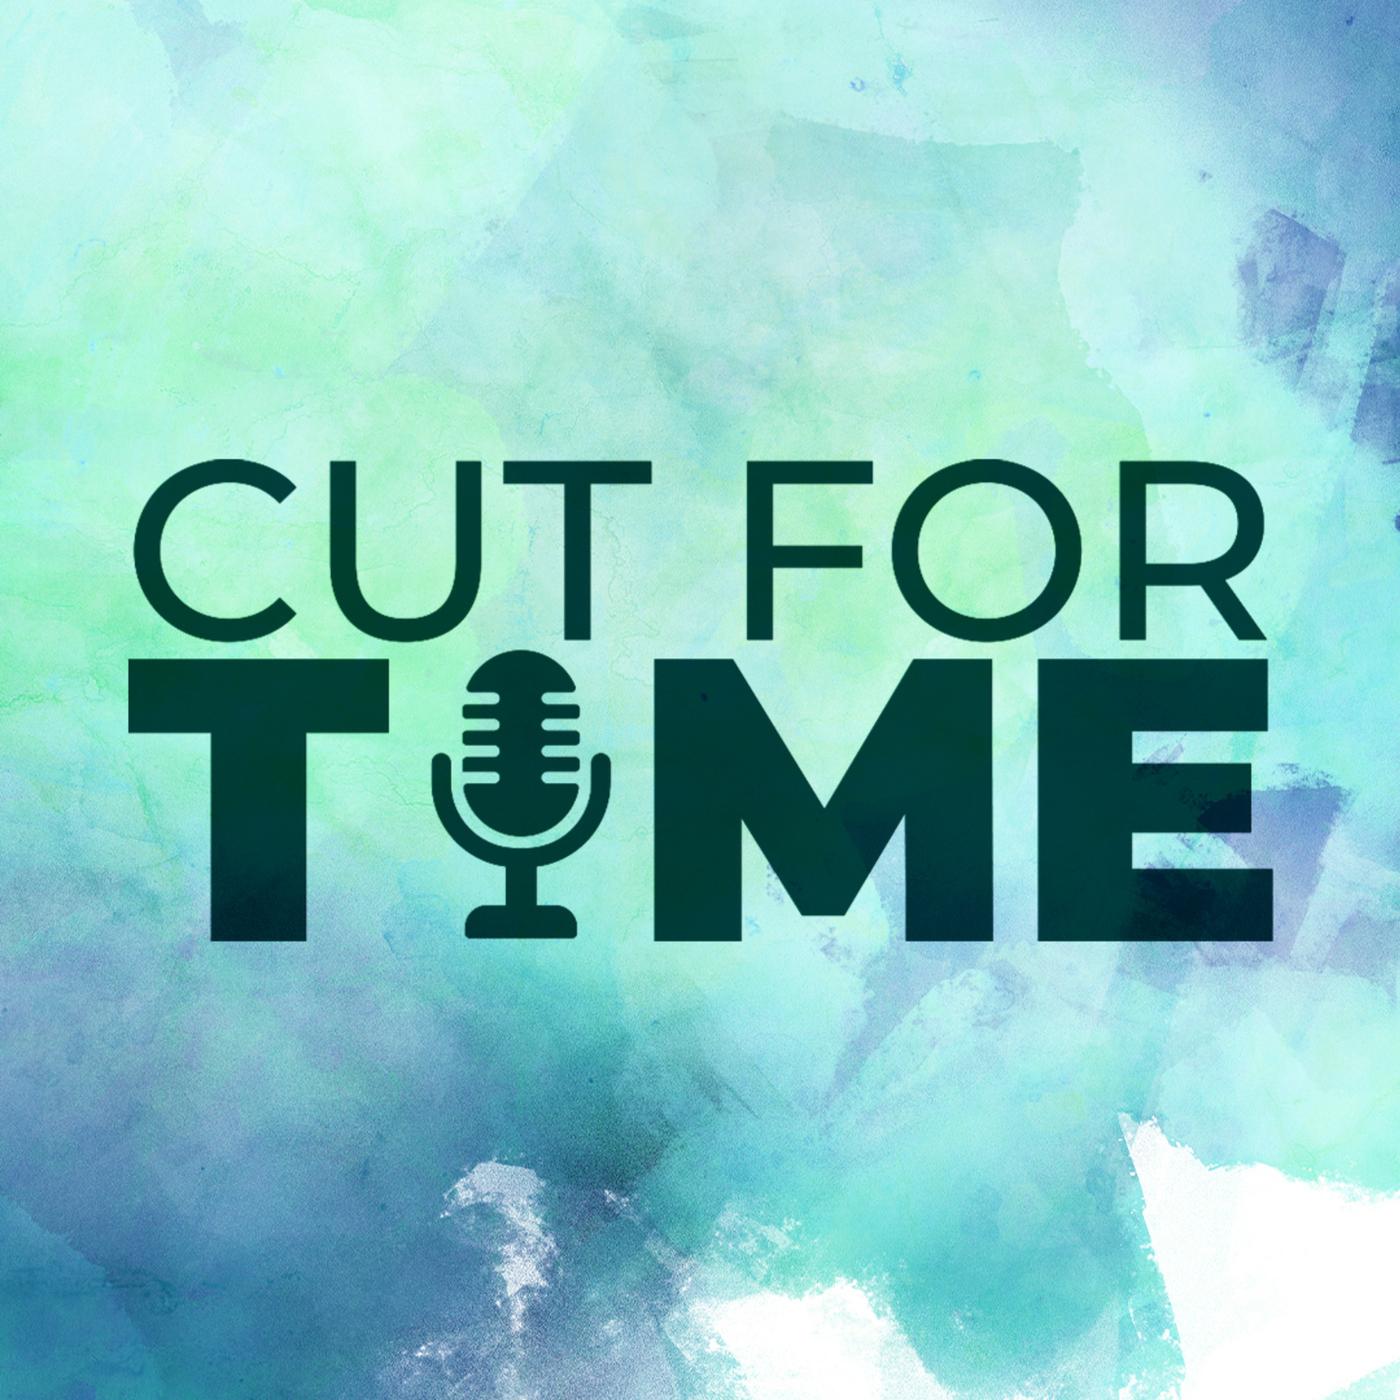 Faith Church Indy cut-for-time-011: Cut for Time: Philippians 4:2-9